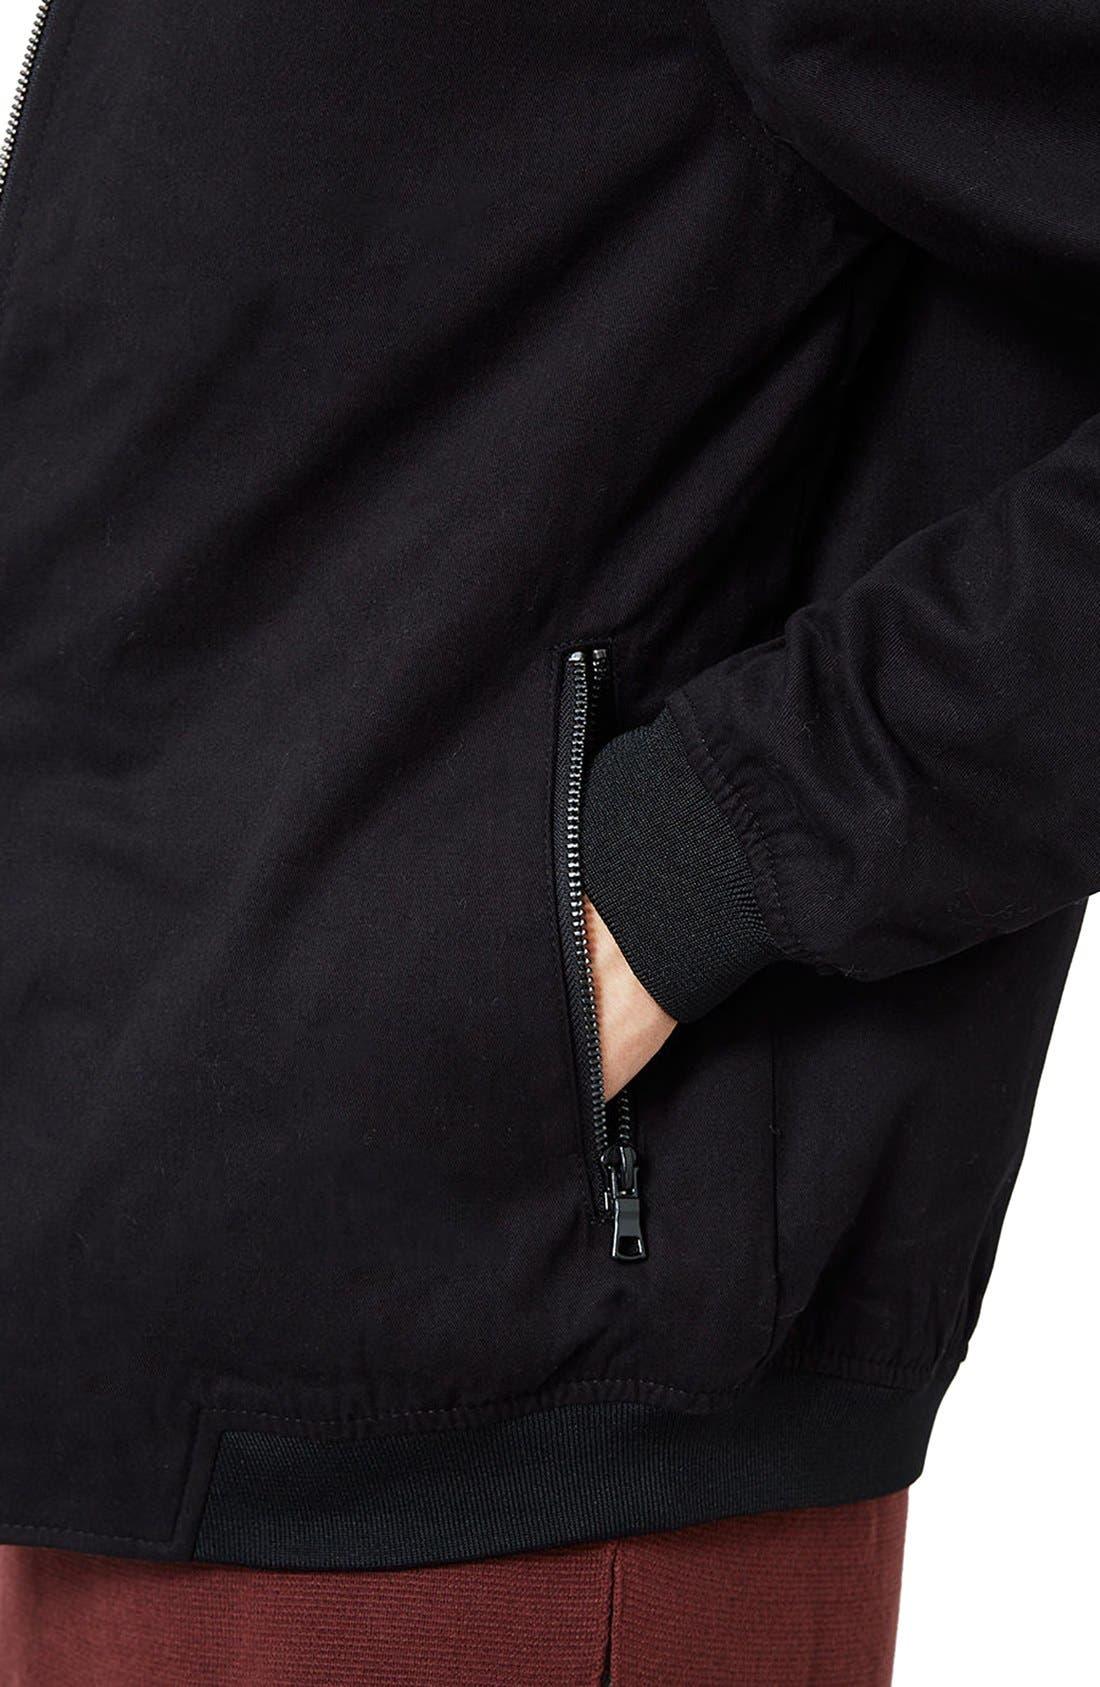 Cotton Bomber Jacket,                             Alternate thumbnail 2, color,                             001